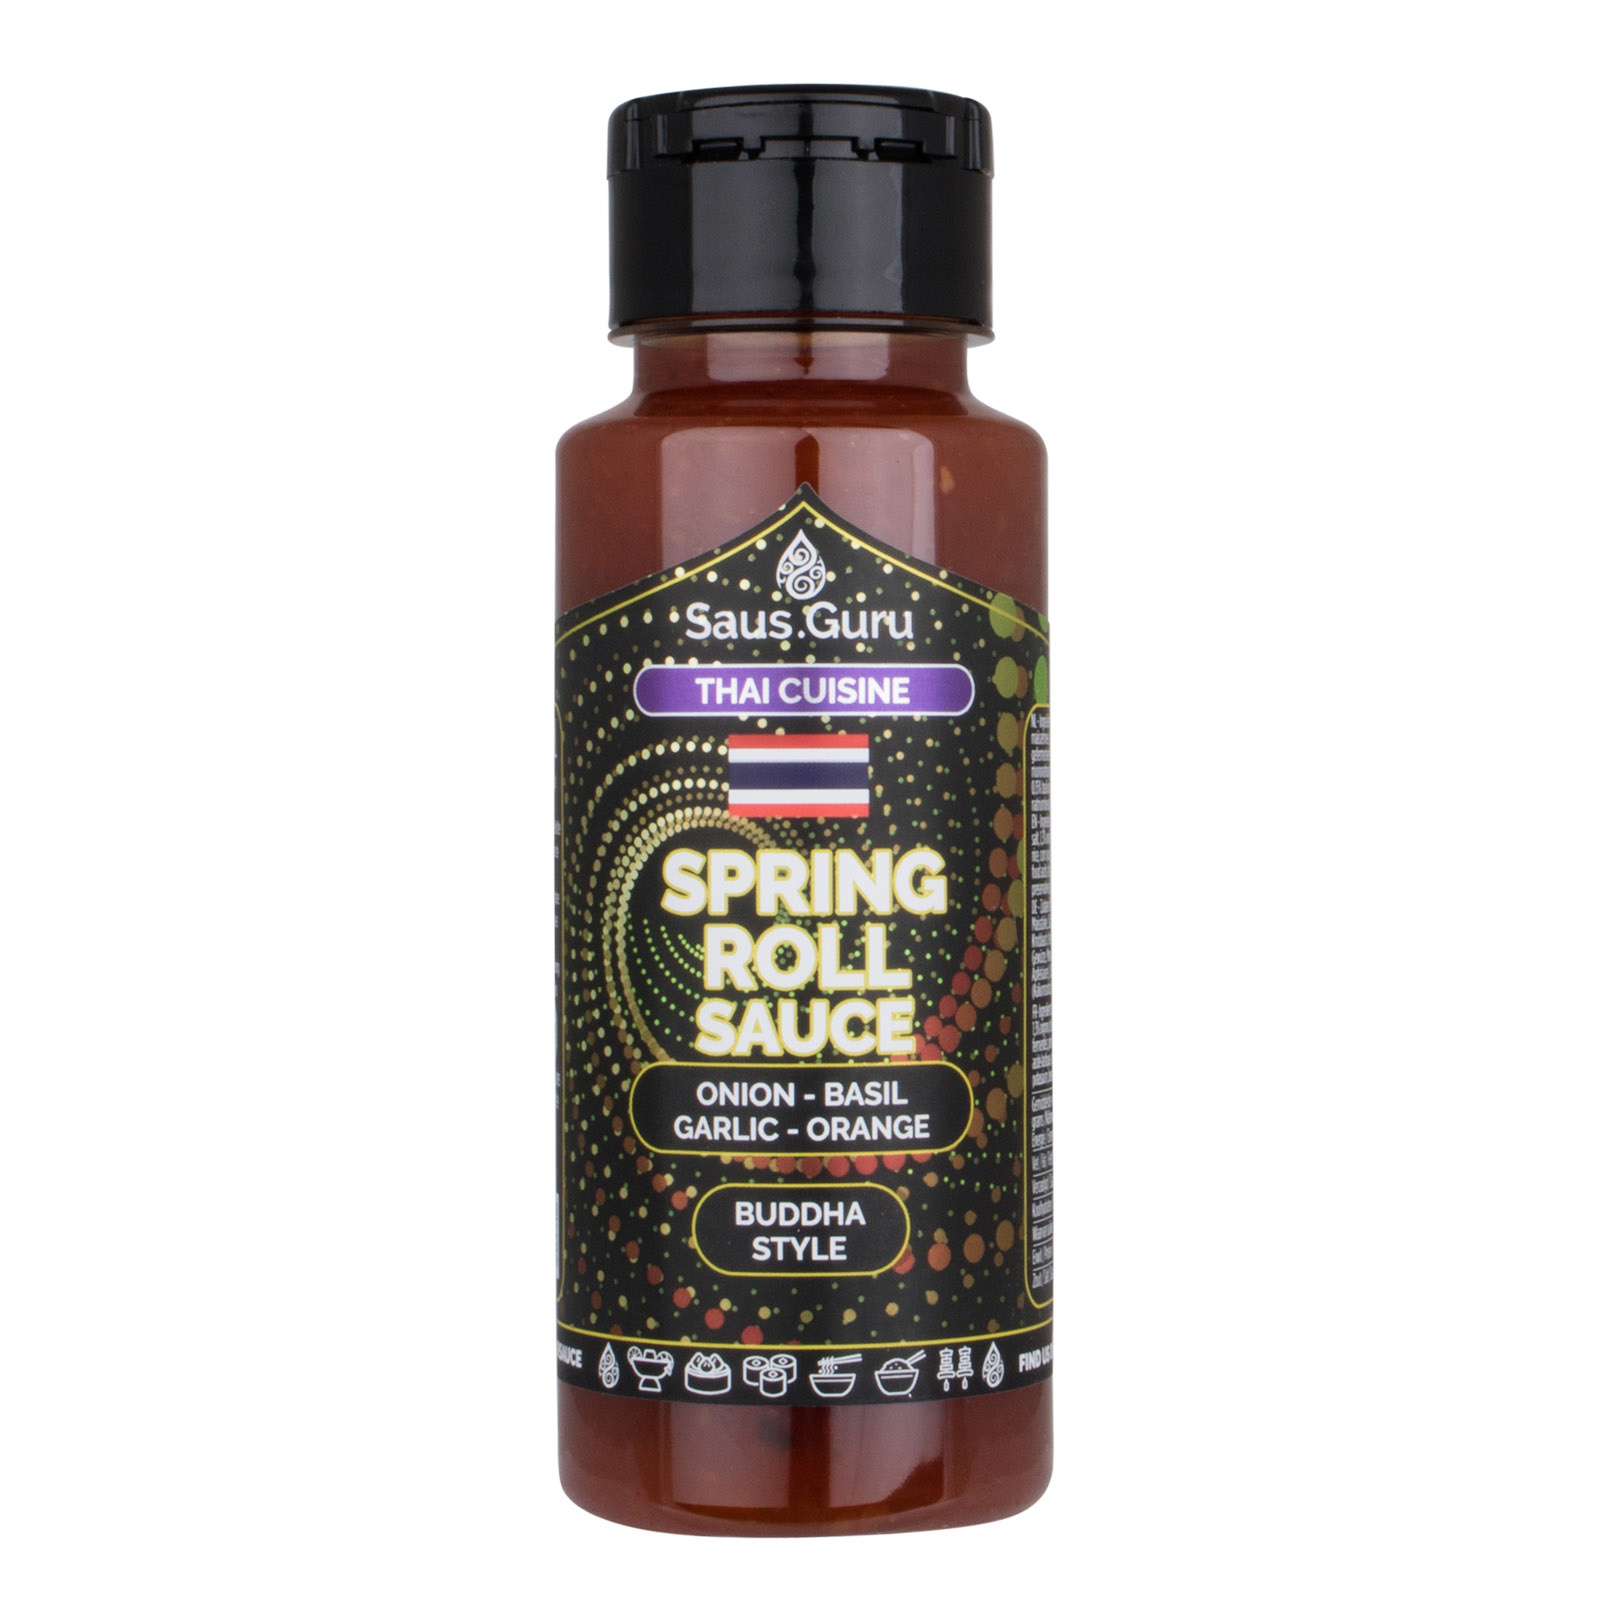 Saus.Guru's Spring Roll Sauce-1